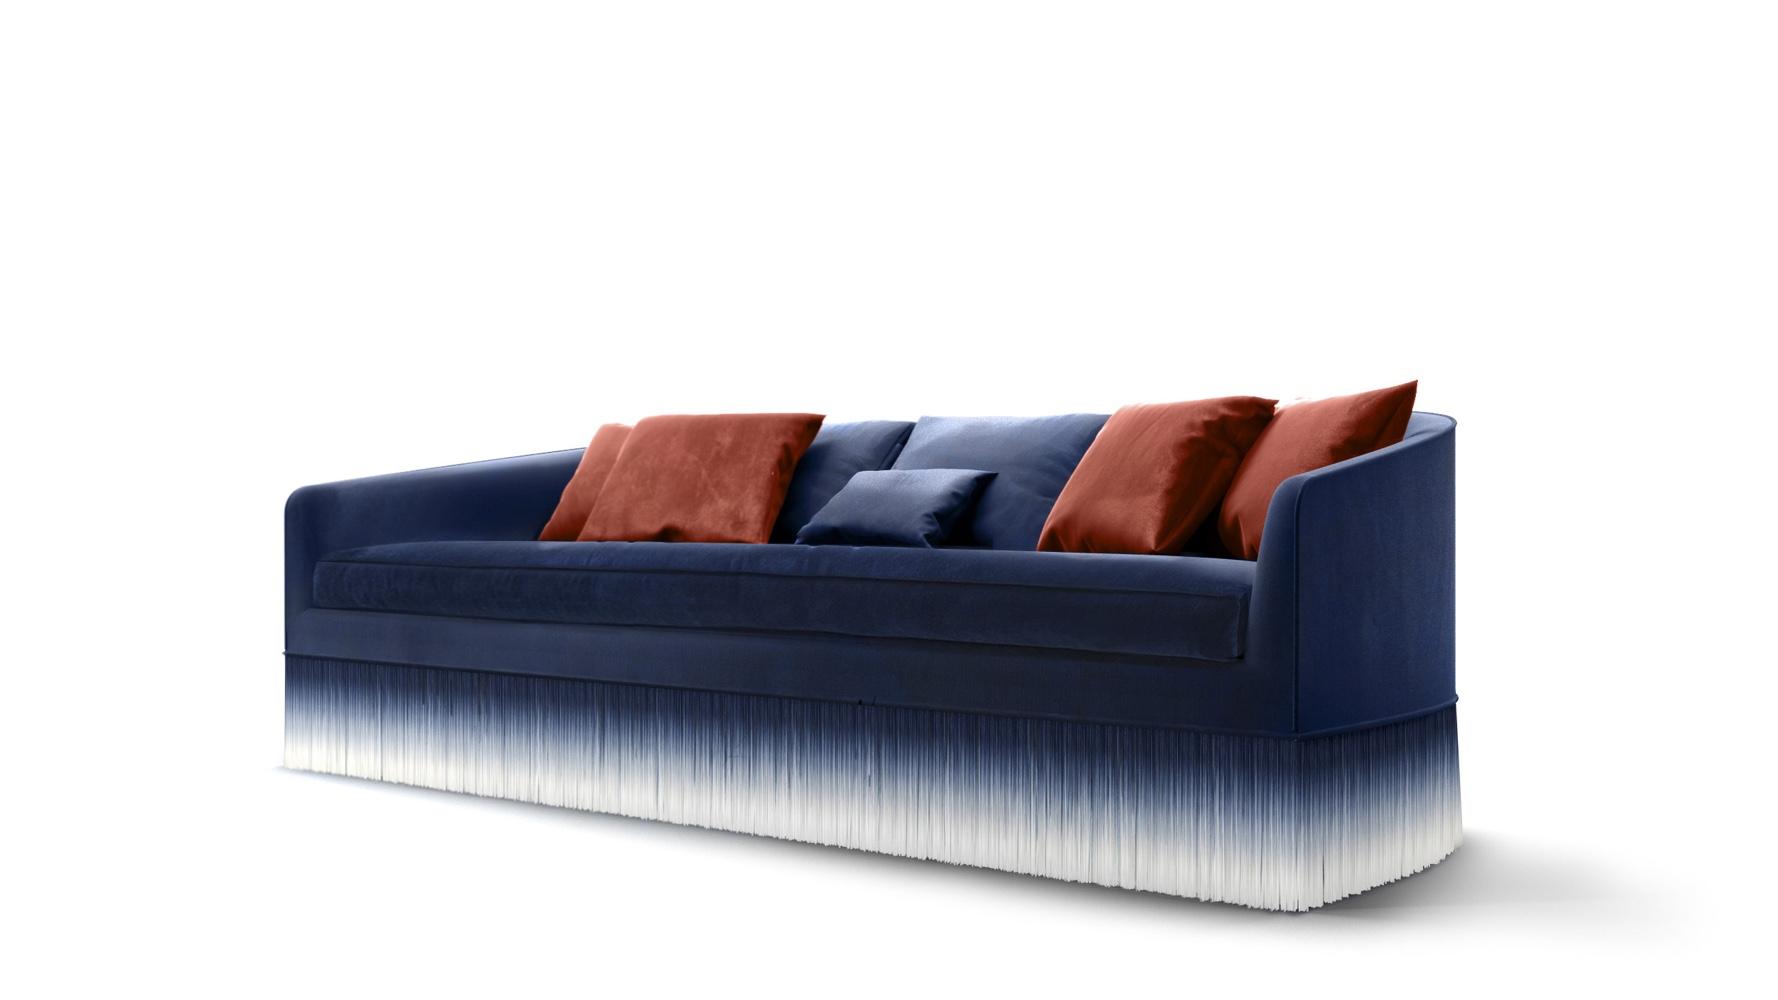 Amami sofa